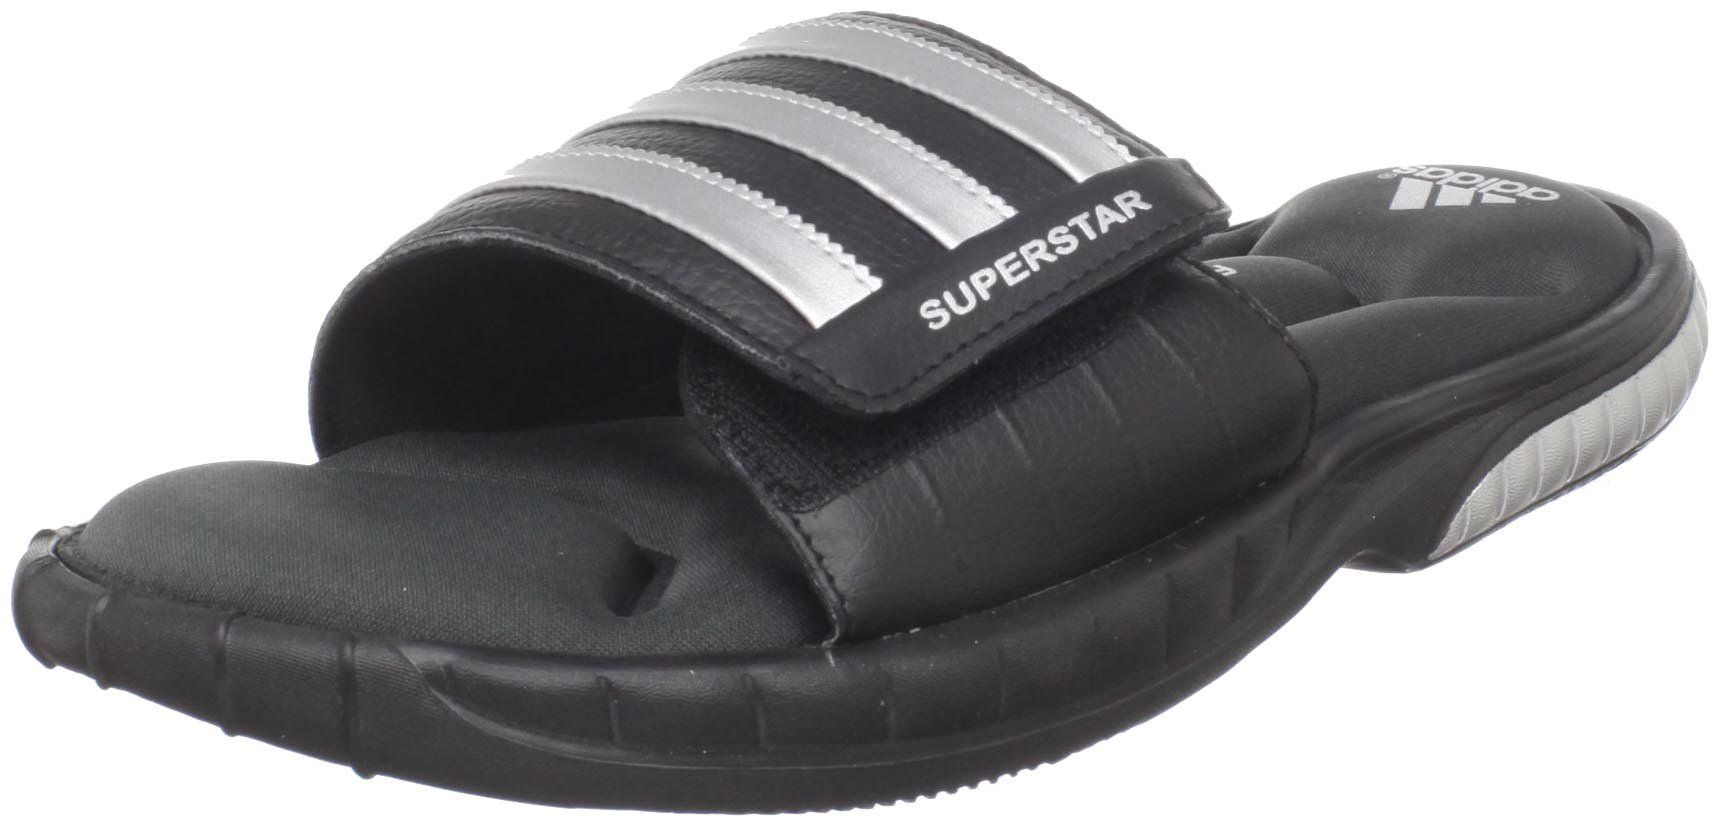 f94a46bb74c1 adidas Men s Superstar 3G Slide Sandal